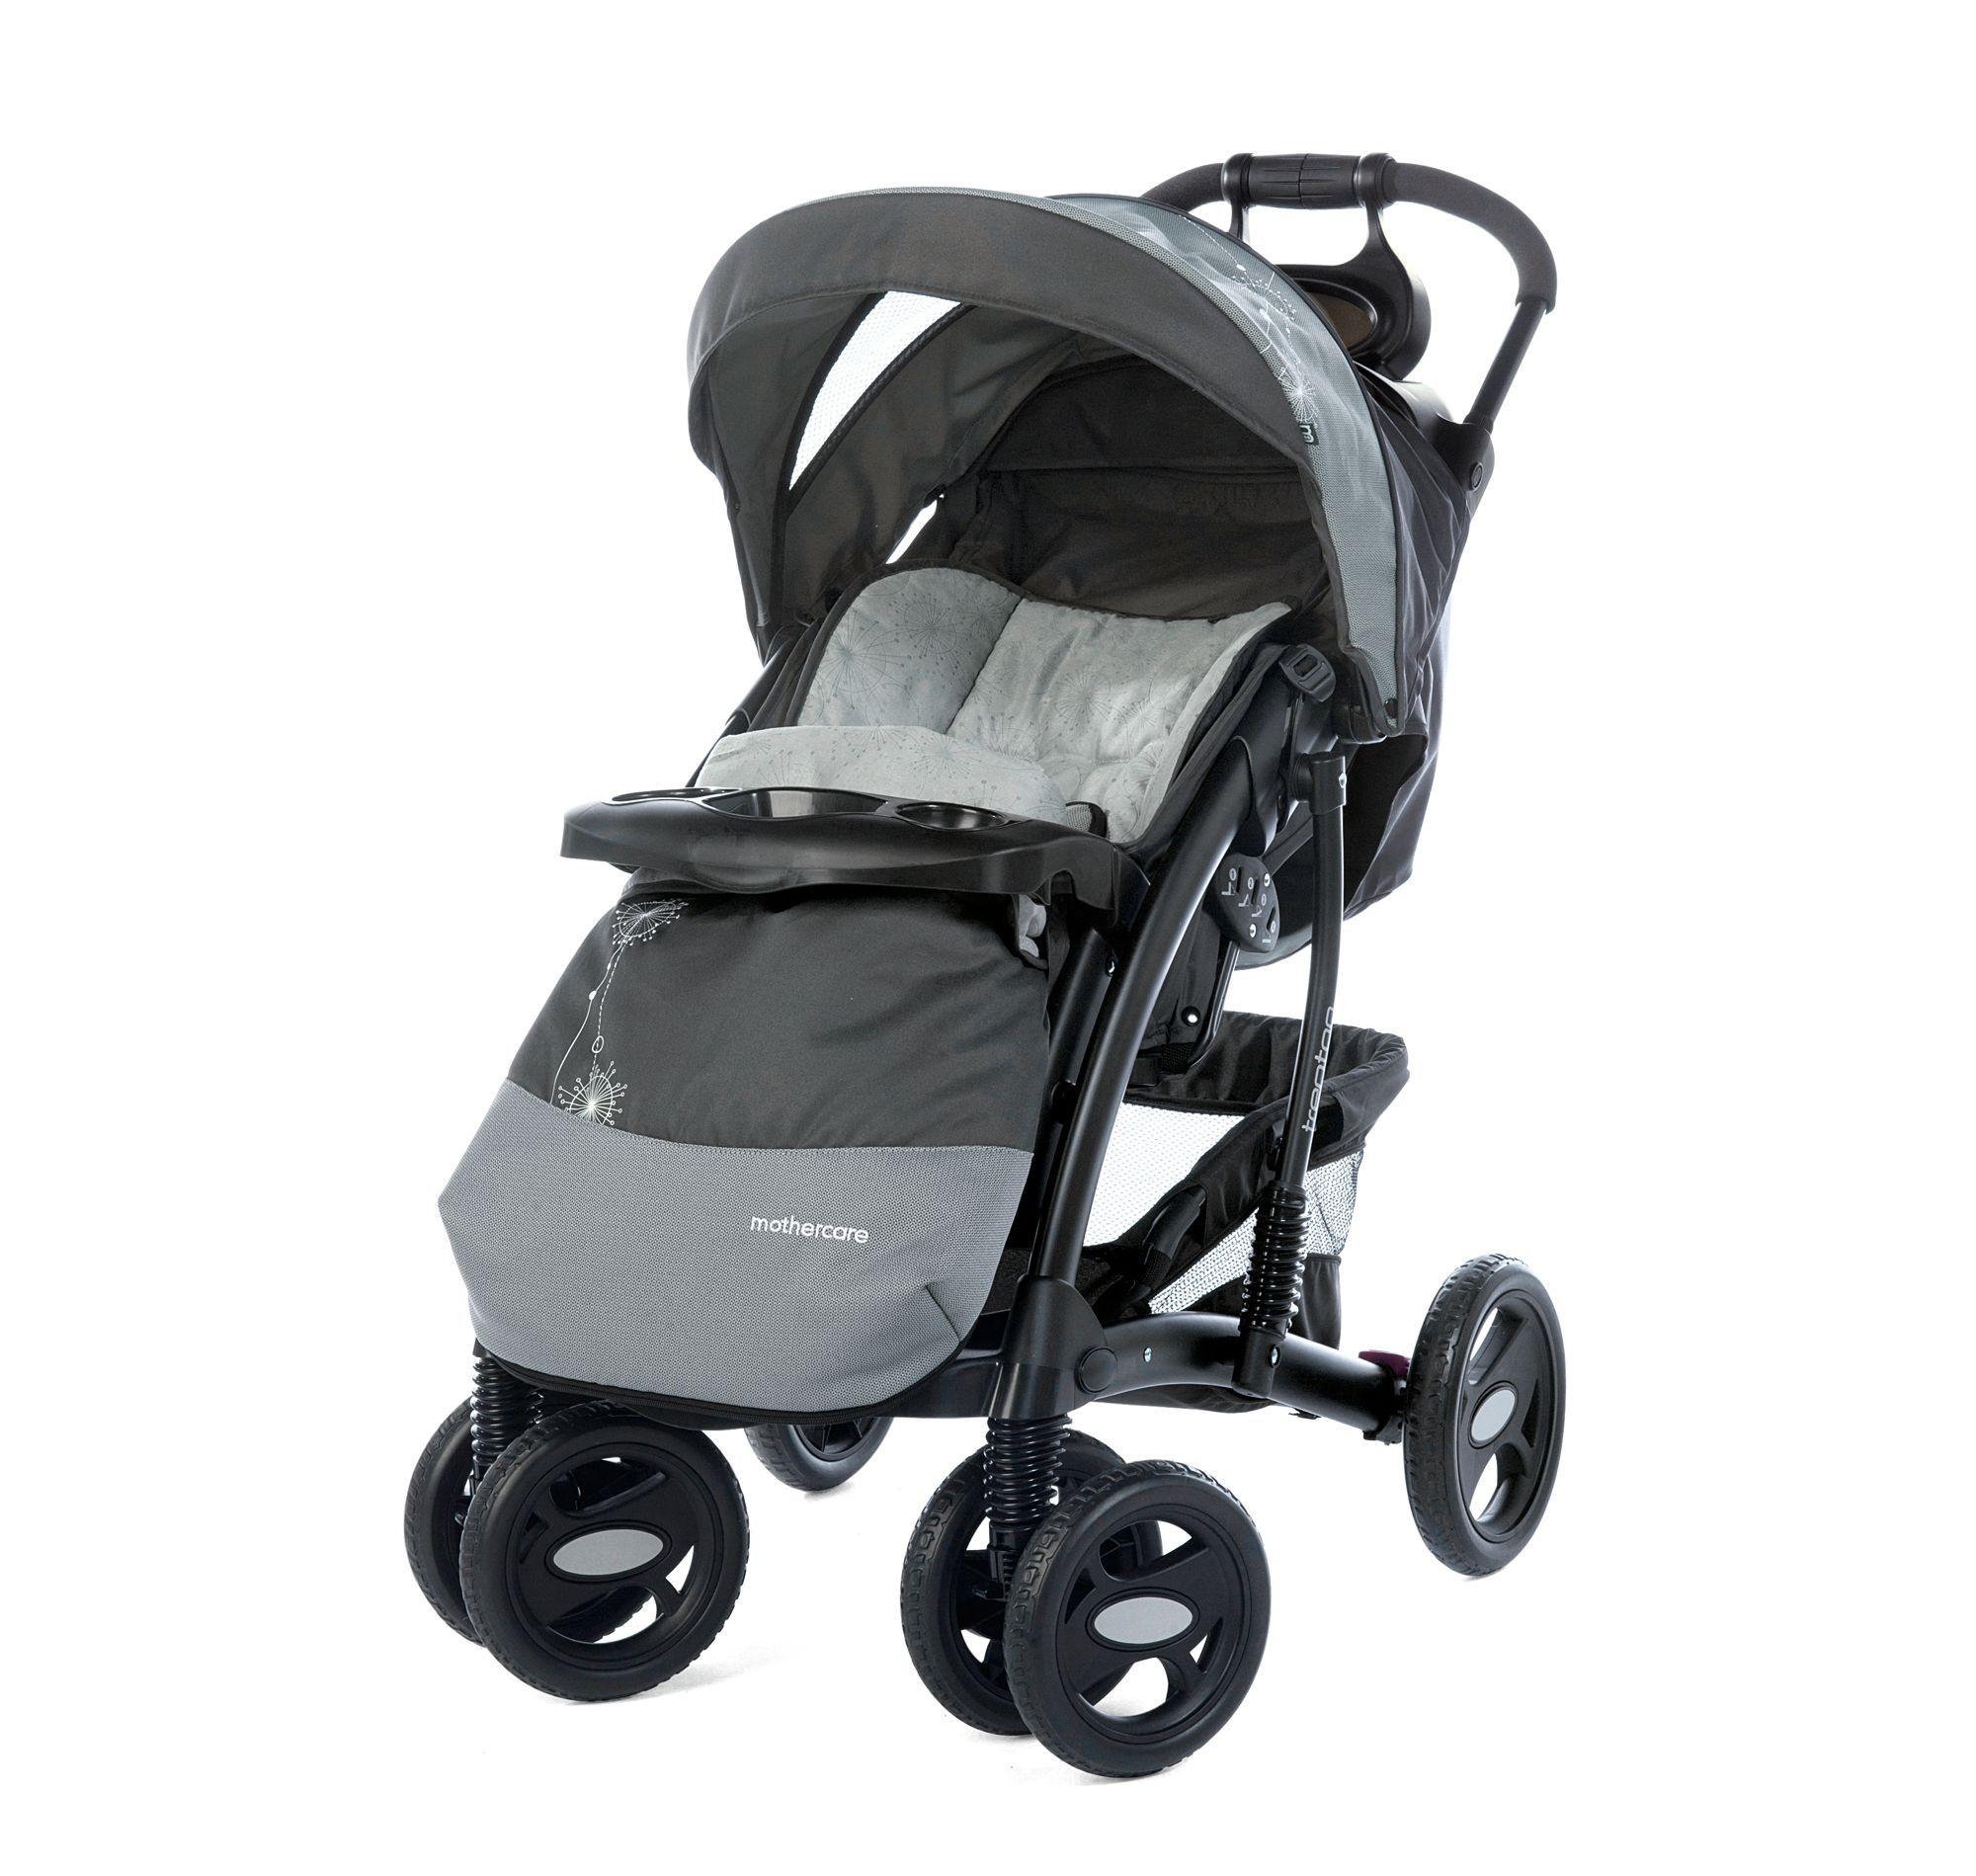 Mothercare Trenton Deluxe plete Pram and Pushchair Travel System Mira